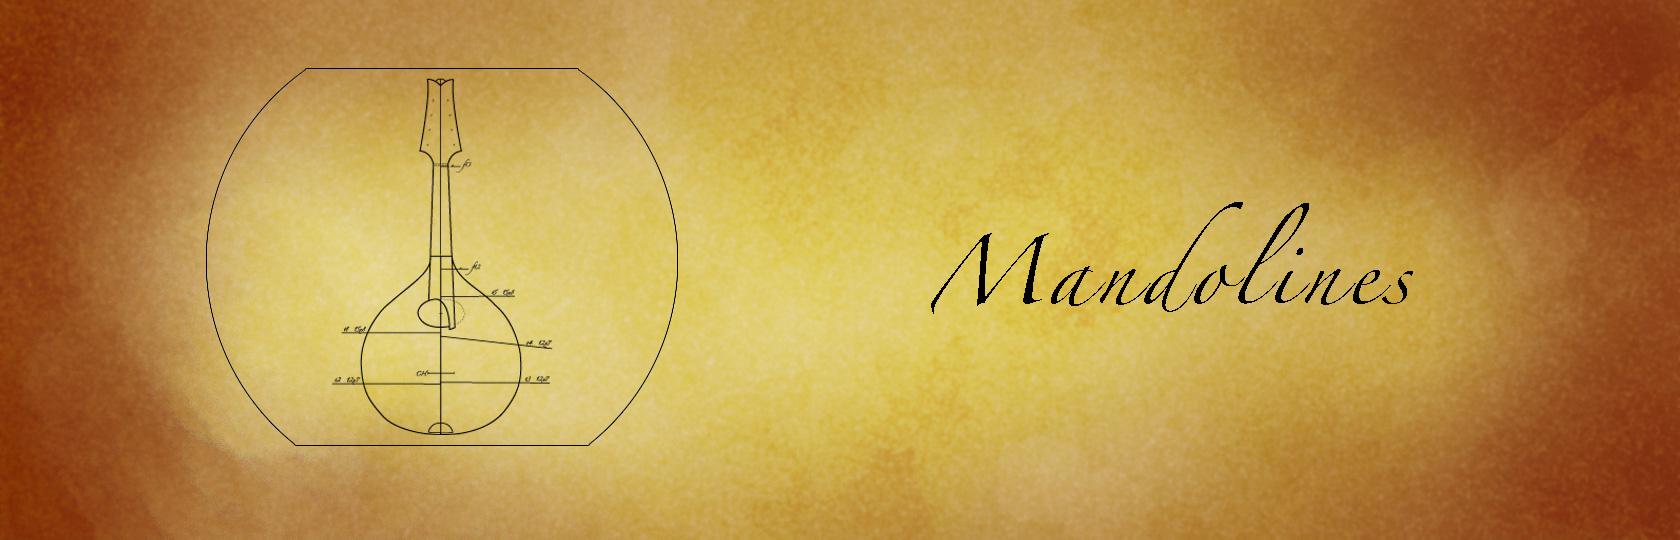 mandolines_banner